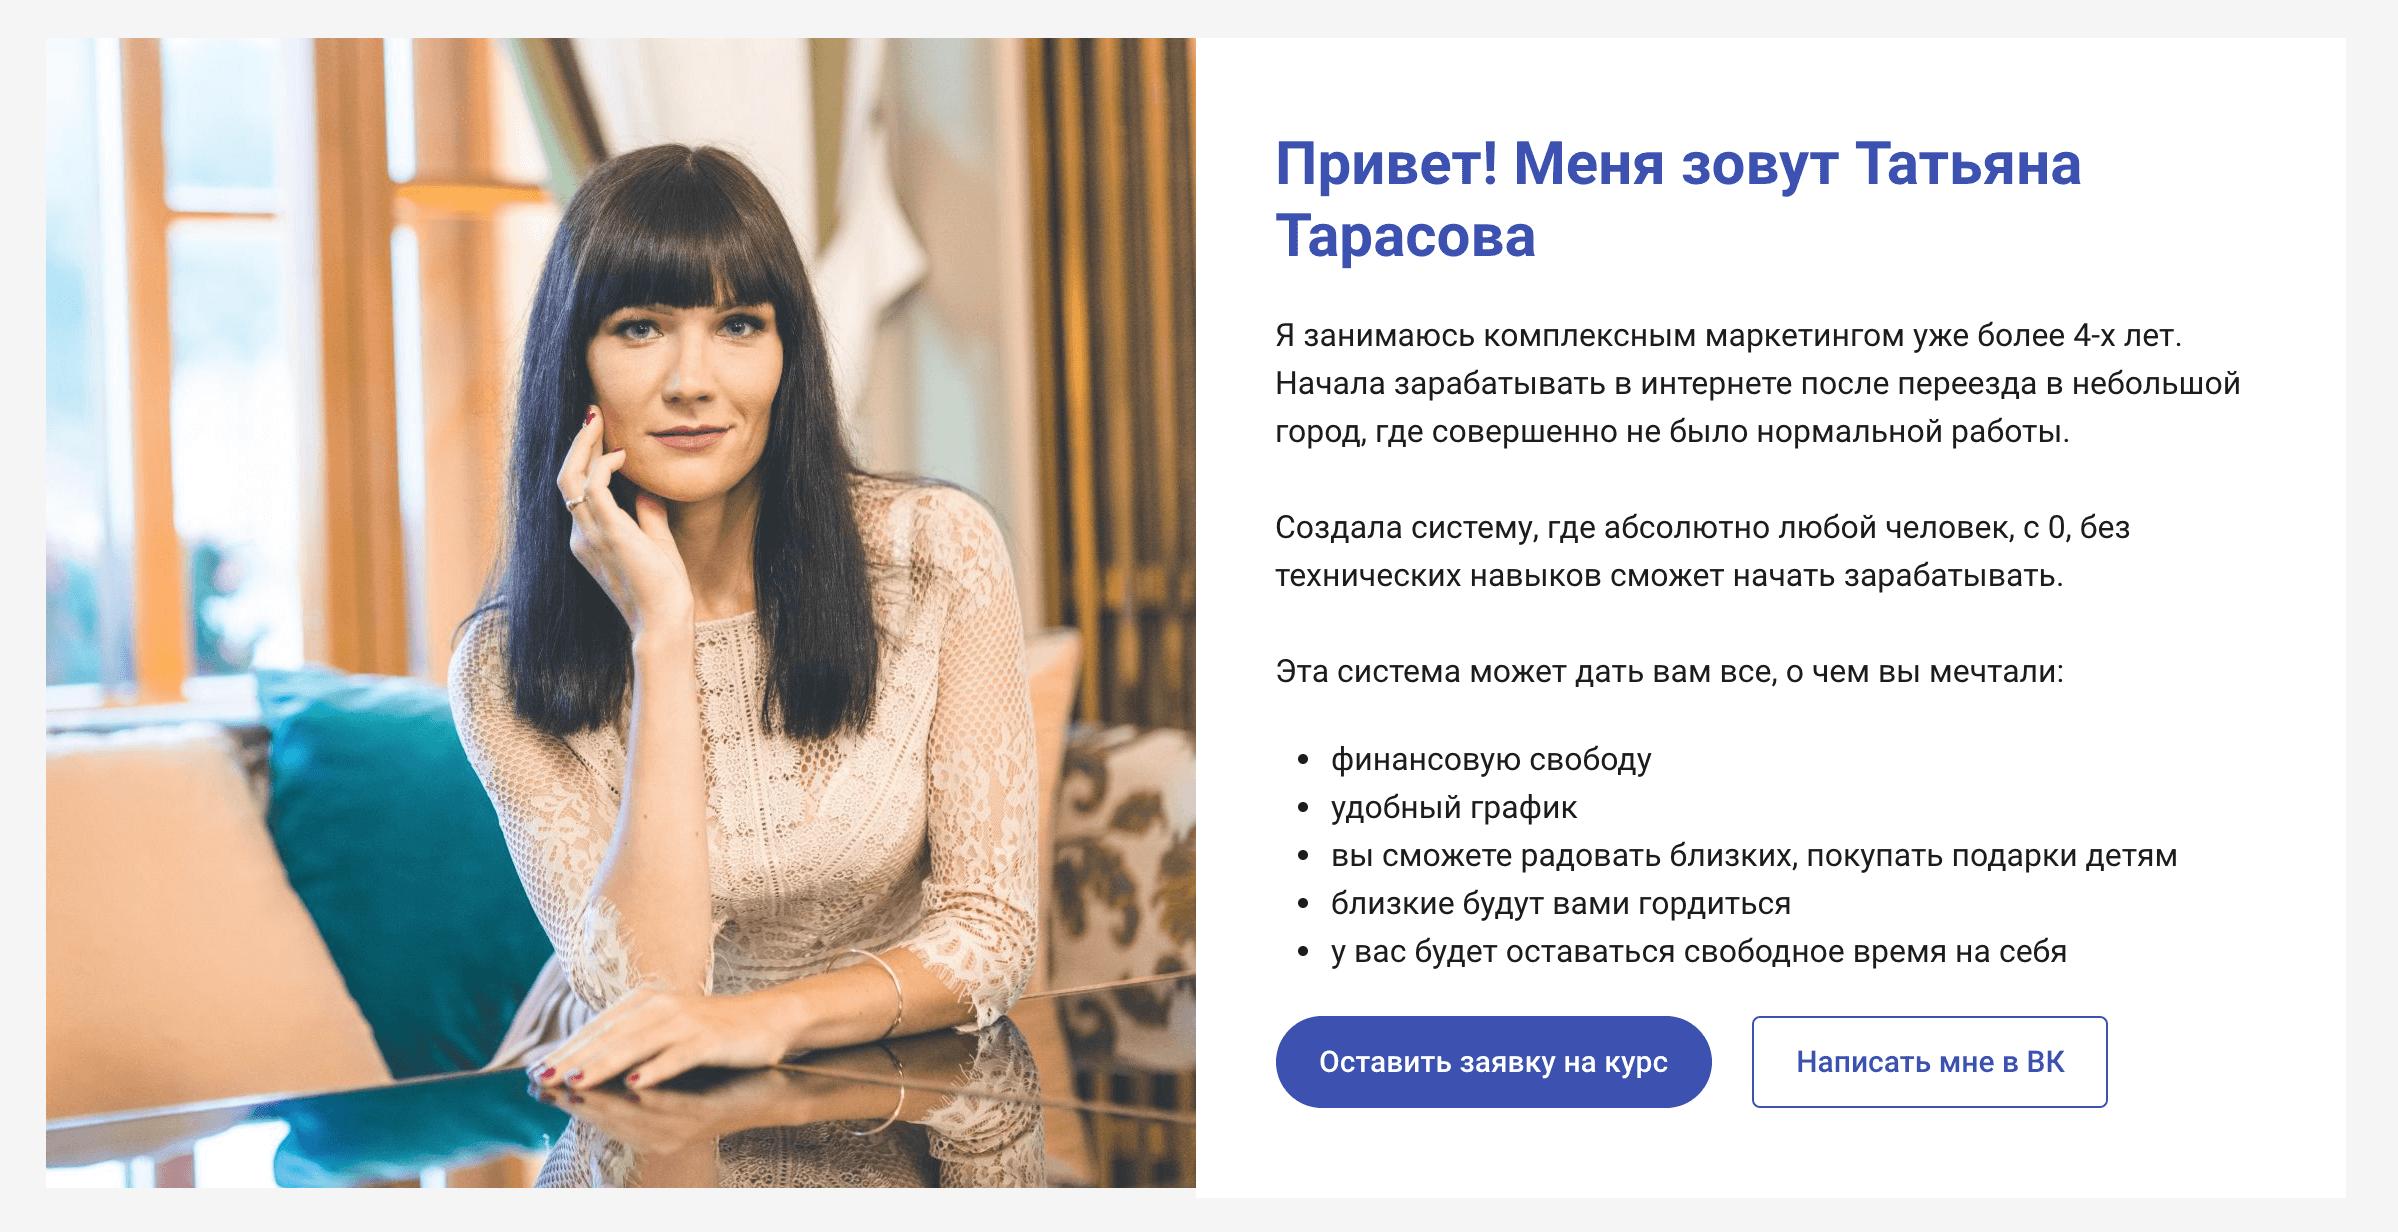 Татьяна Тарасова курс отзывы